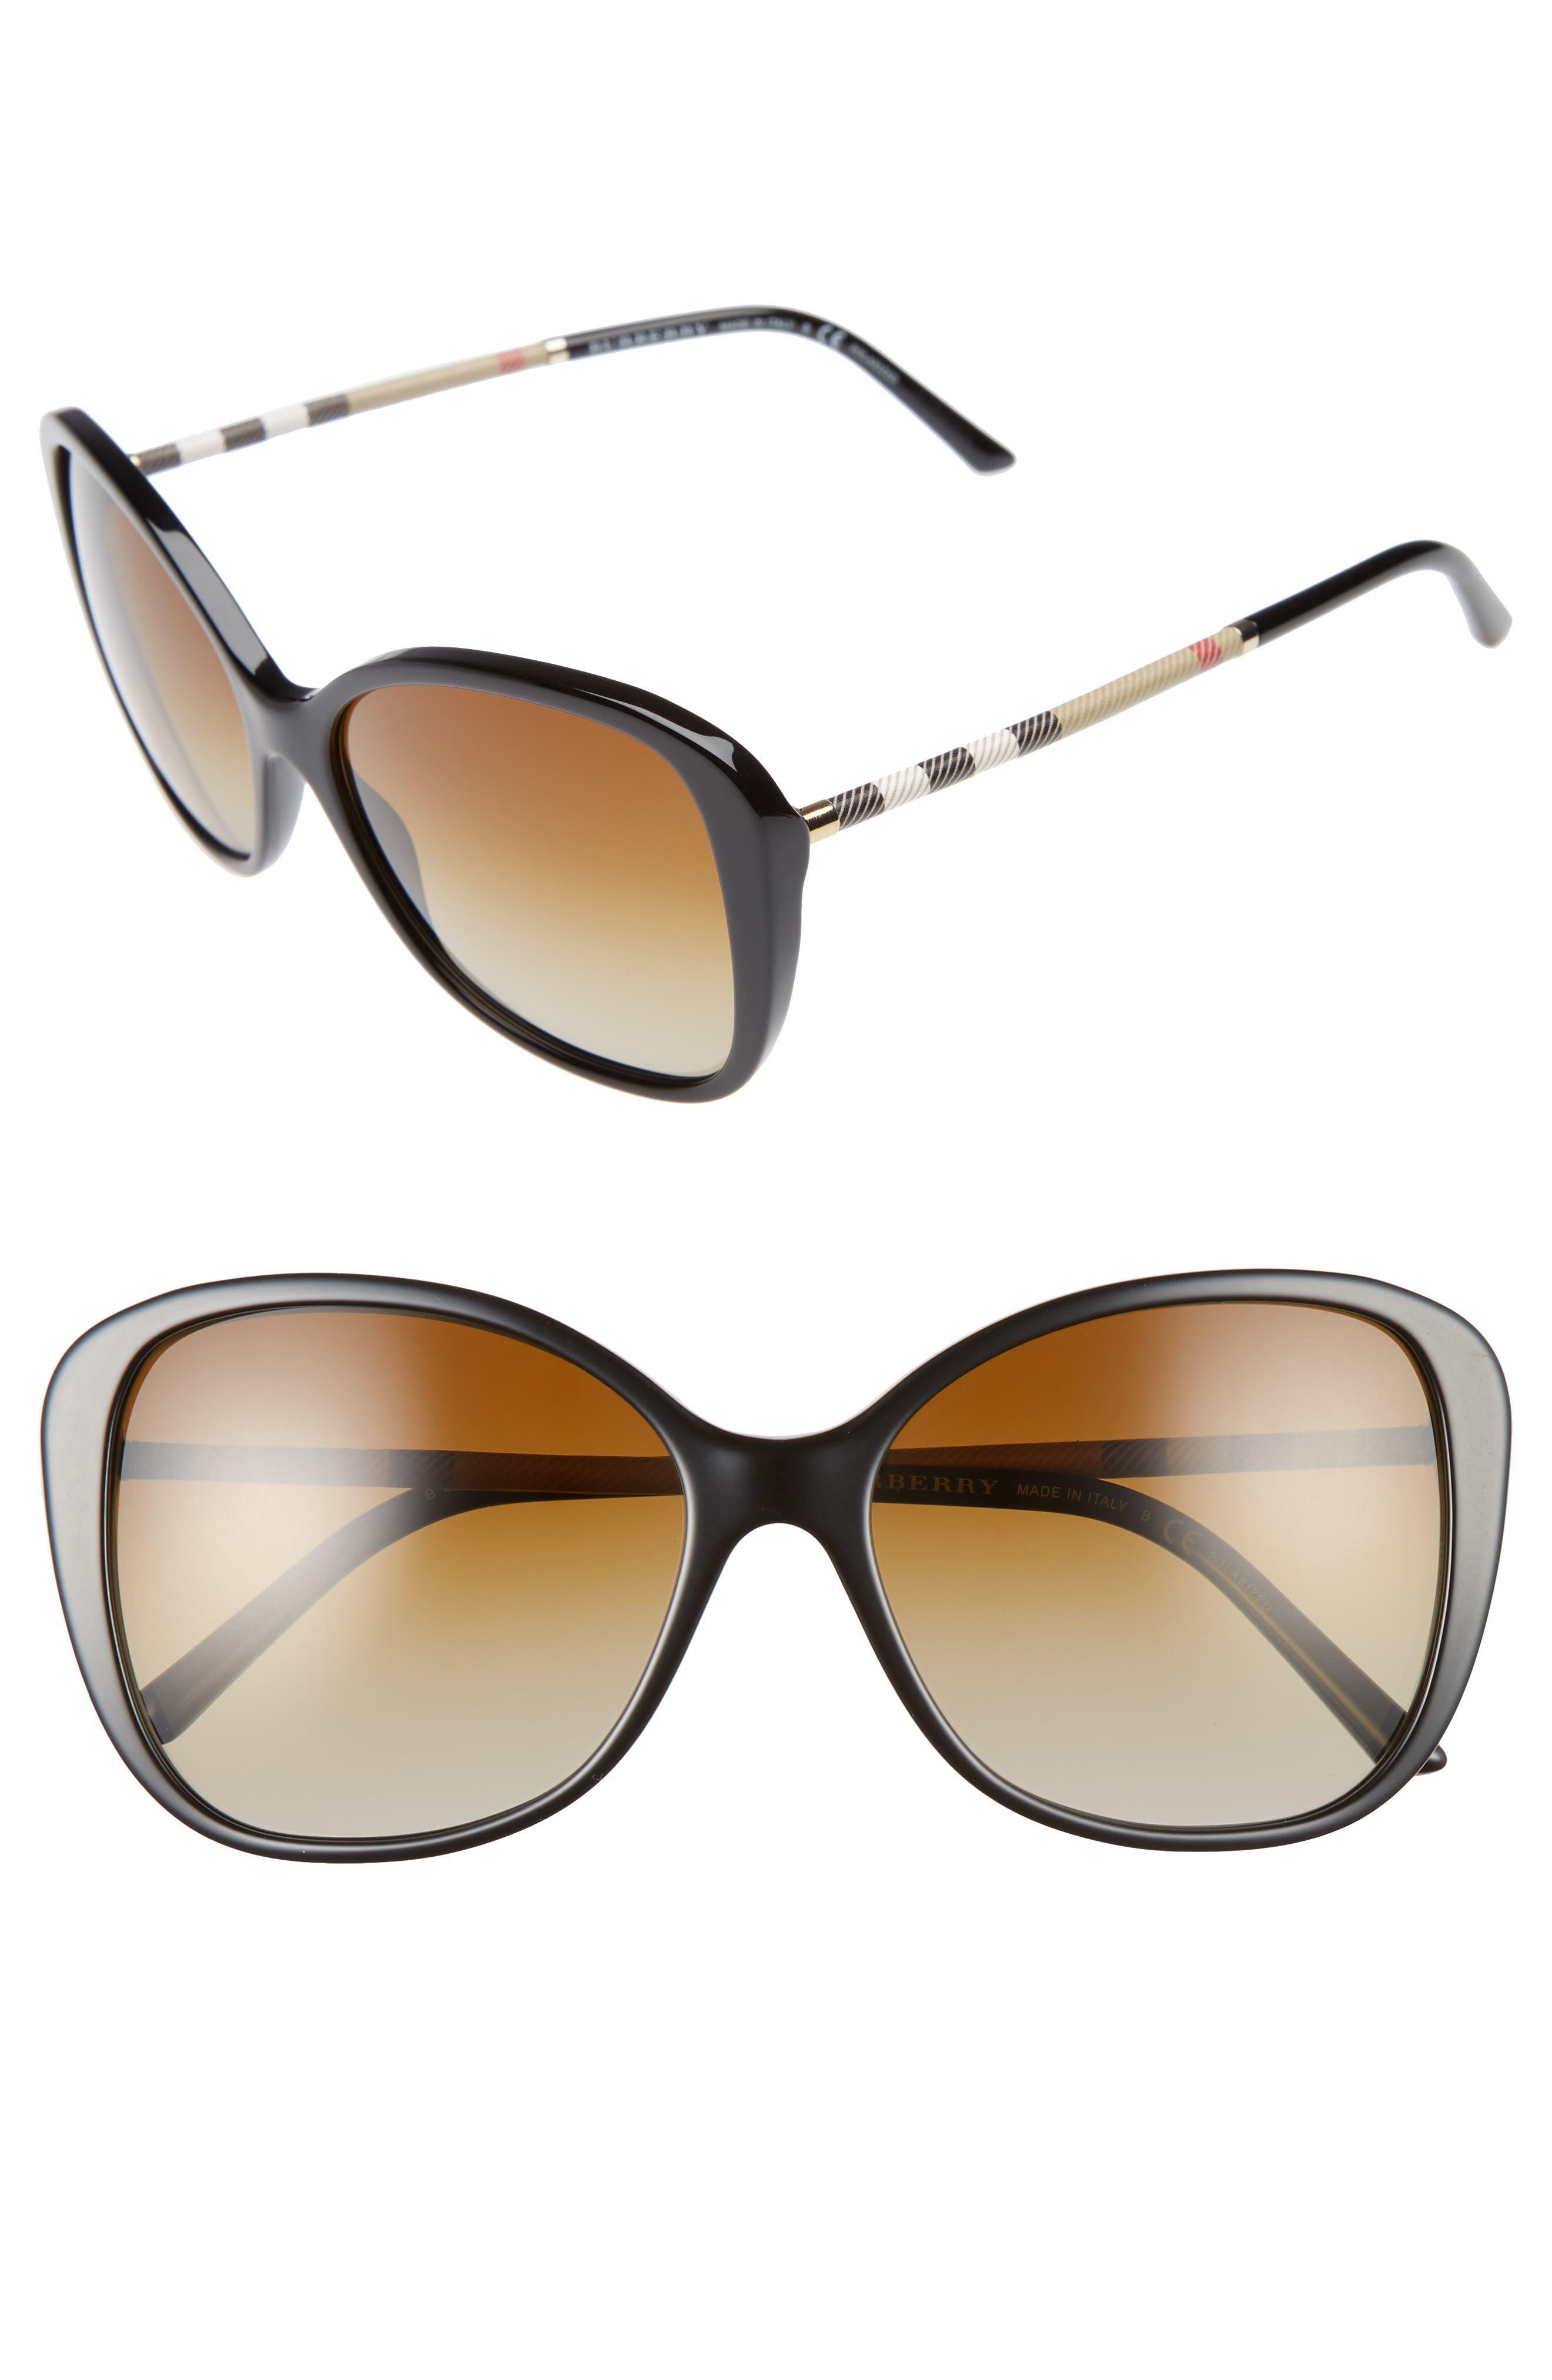 57mm Polarized Sunglasses,                             Main thumbnail 1, color,                             001